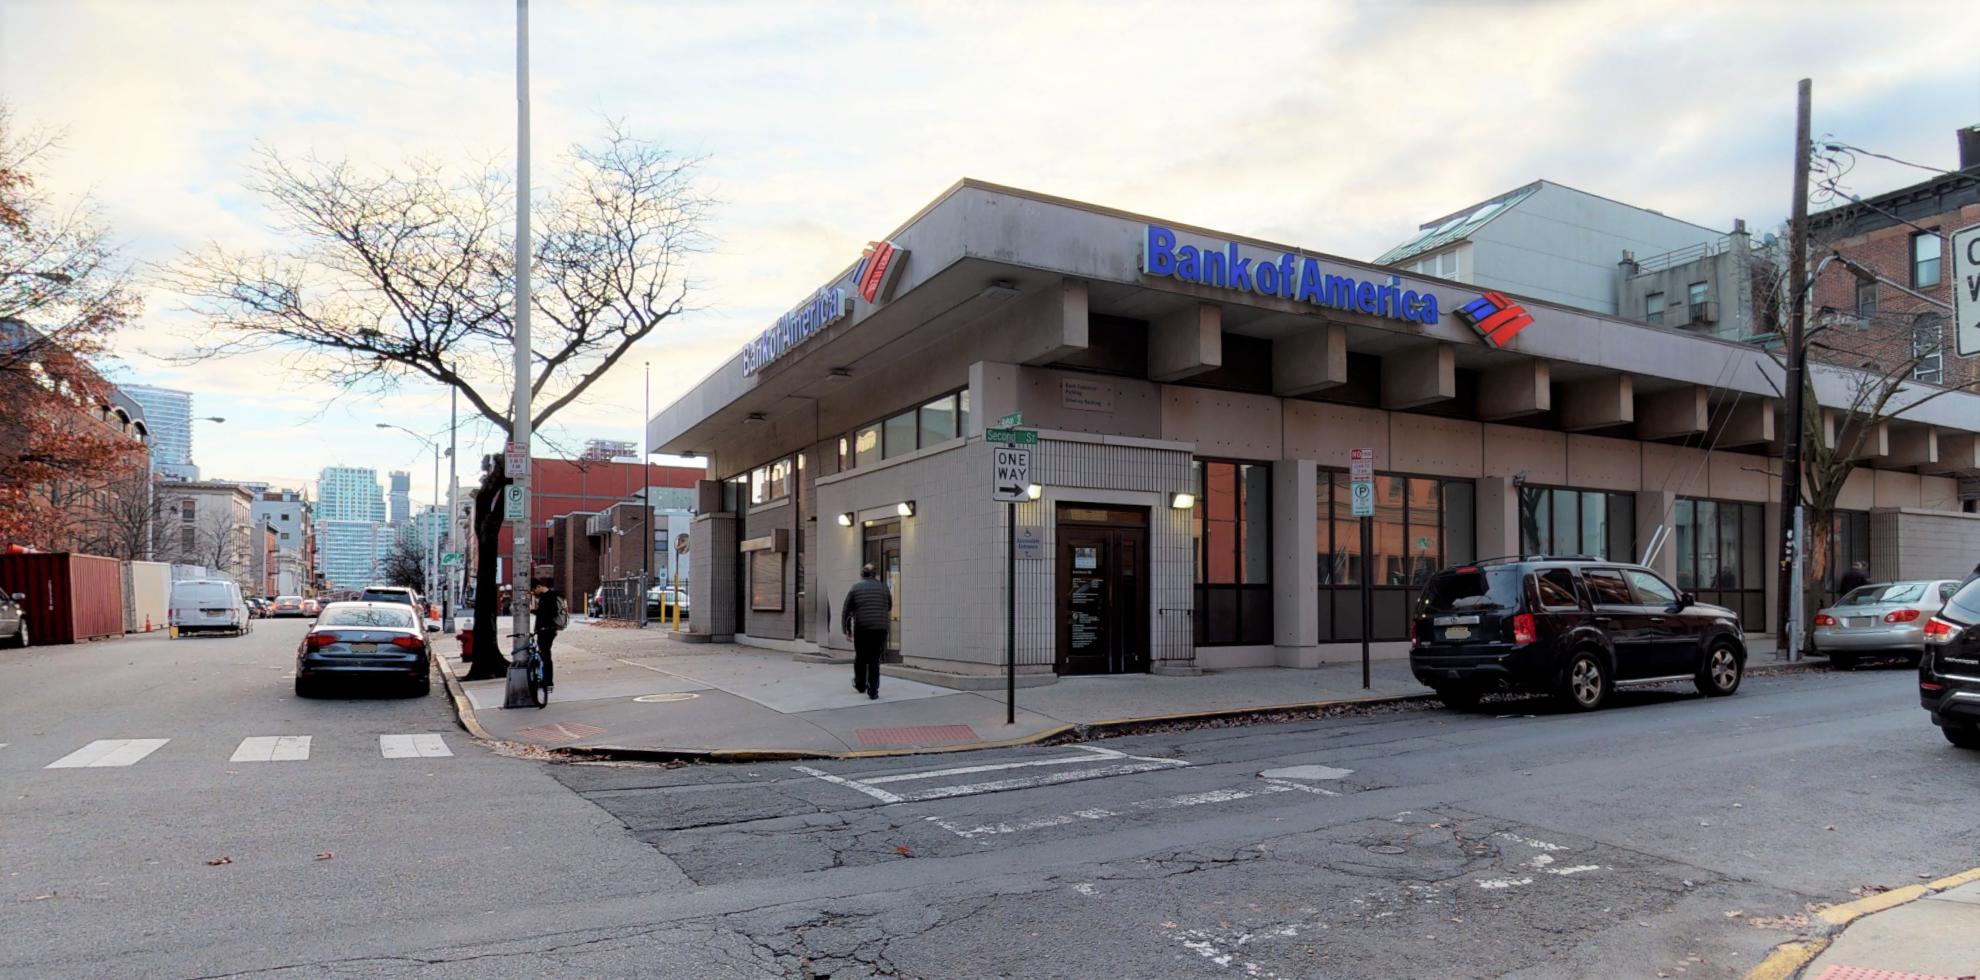 Bank of America financial center with drive-thru ATM | 1 Firehouse Plz, Hoboken, NJ 07030